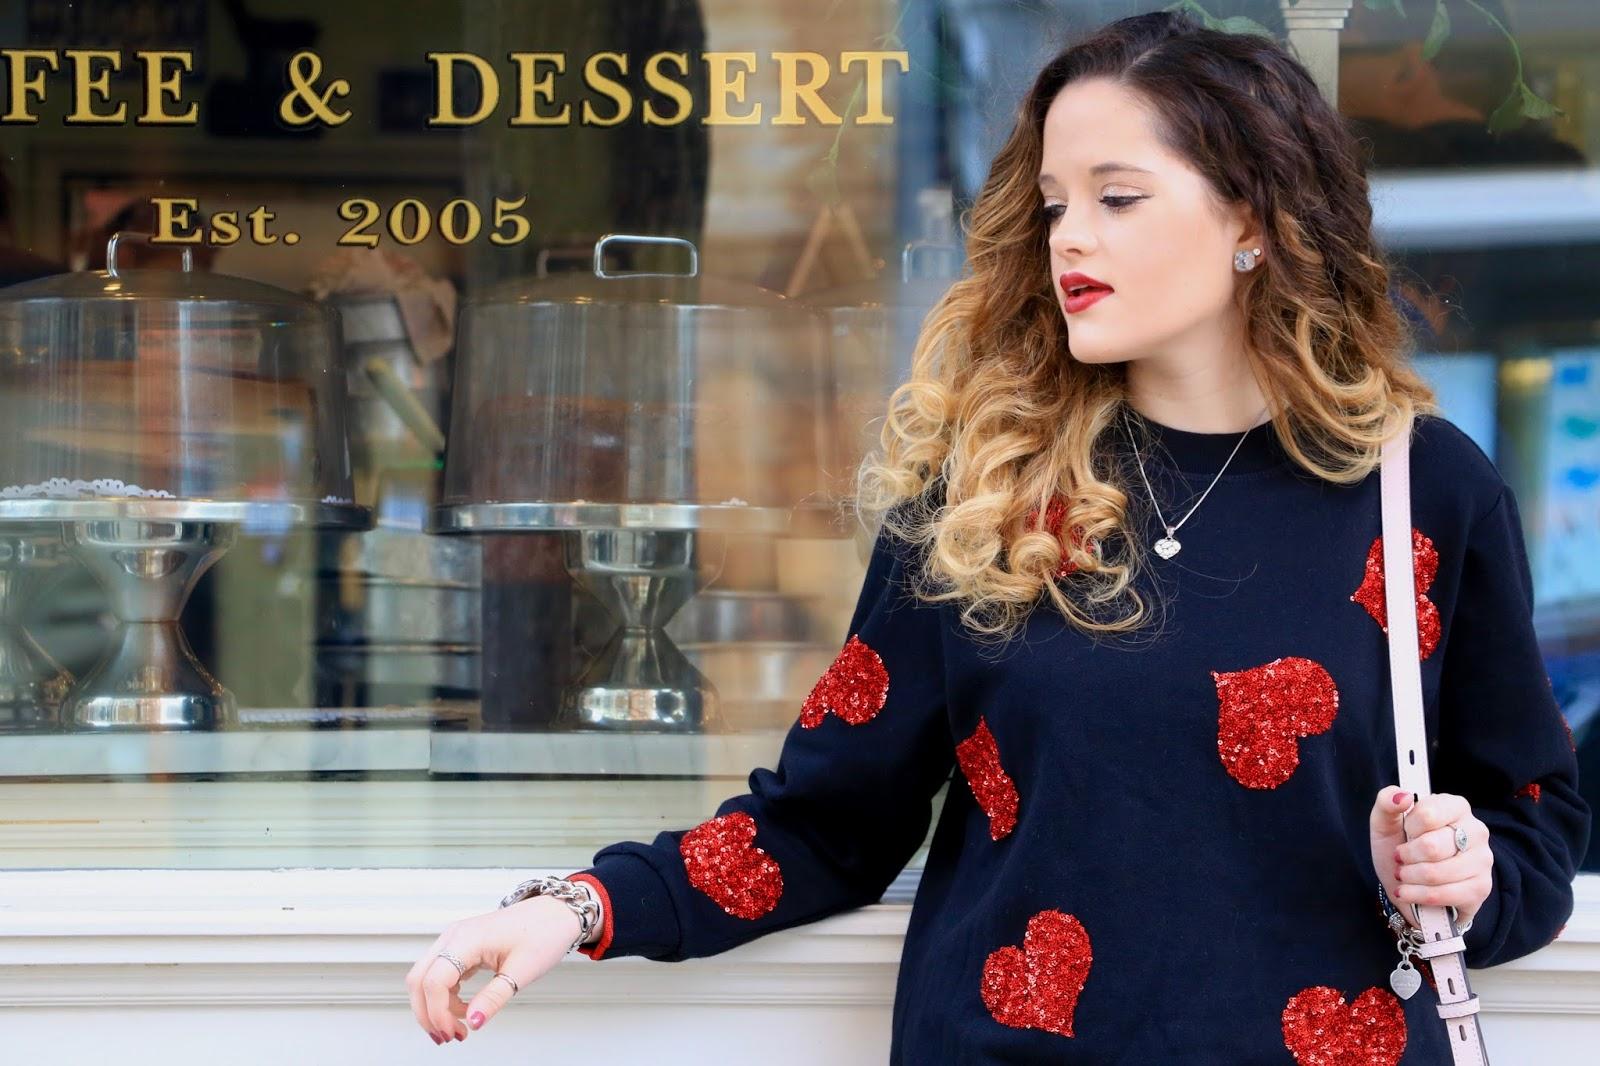 Nyc fashion blogger Kathleen Harper wearing a heart sweater